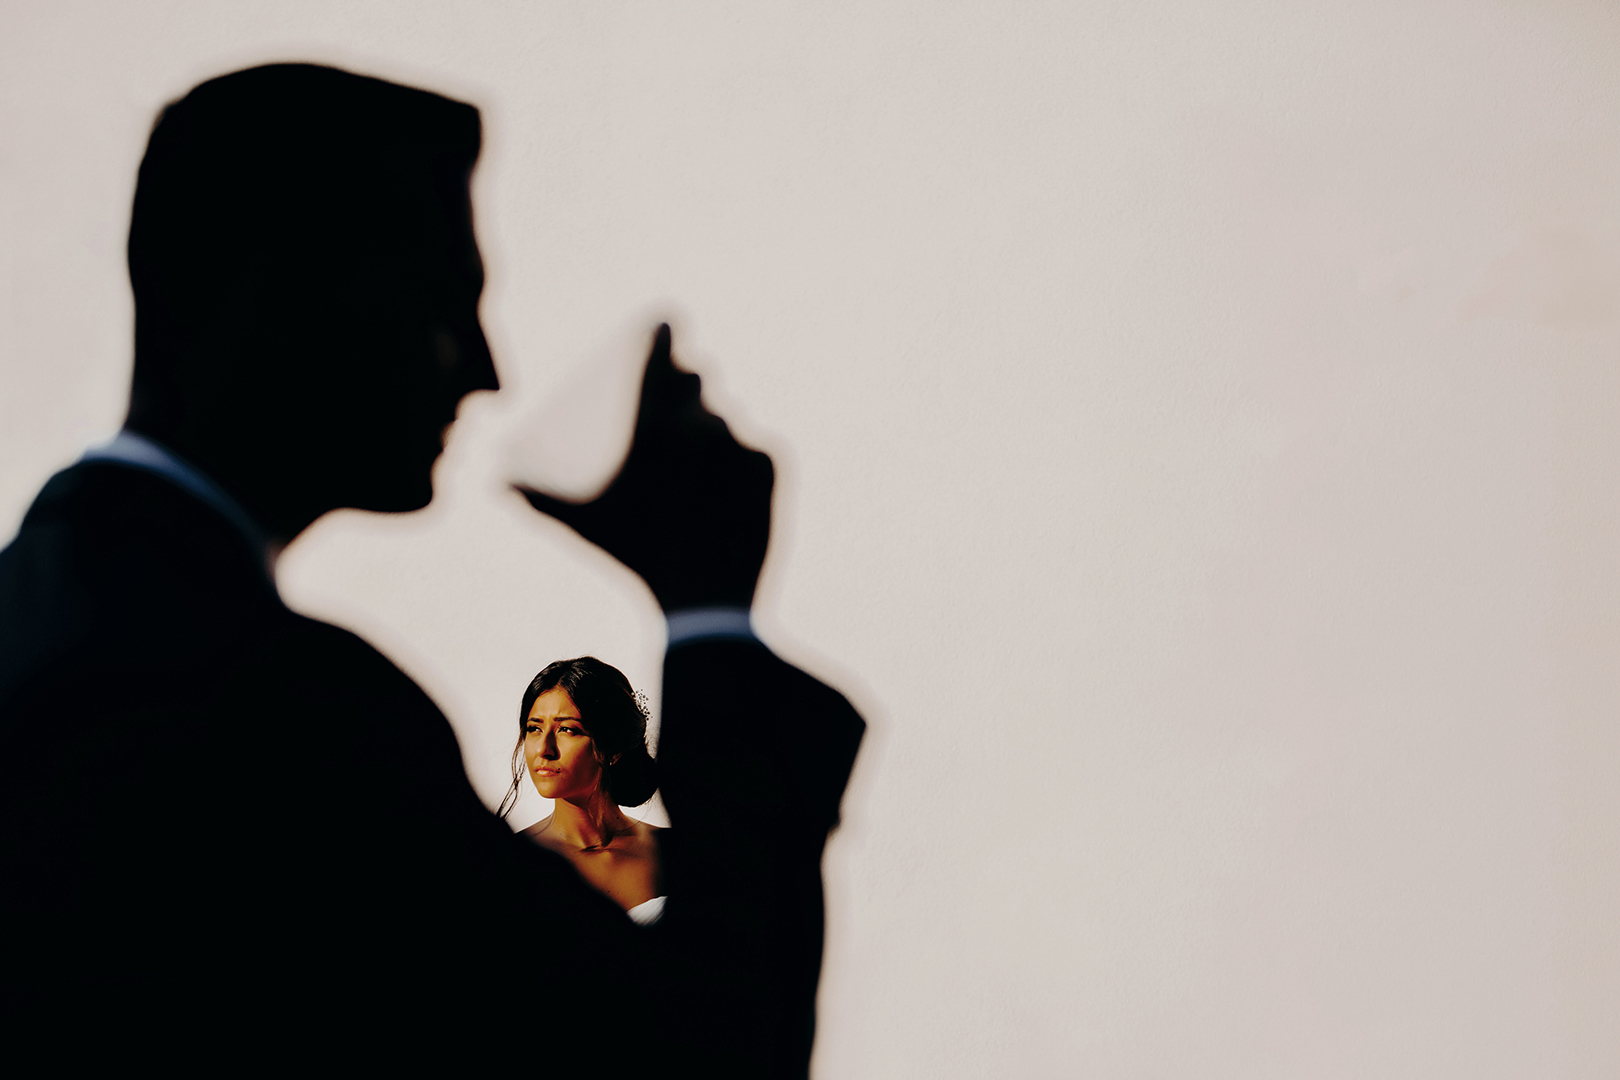 1 gianni-lepore-groom-bride-ritratto-sposi-weddingday-wedding-fotografo-torre-andriana-foggia